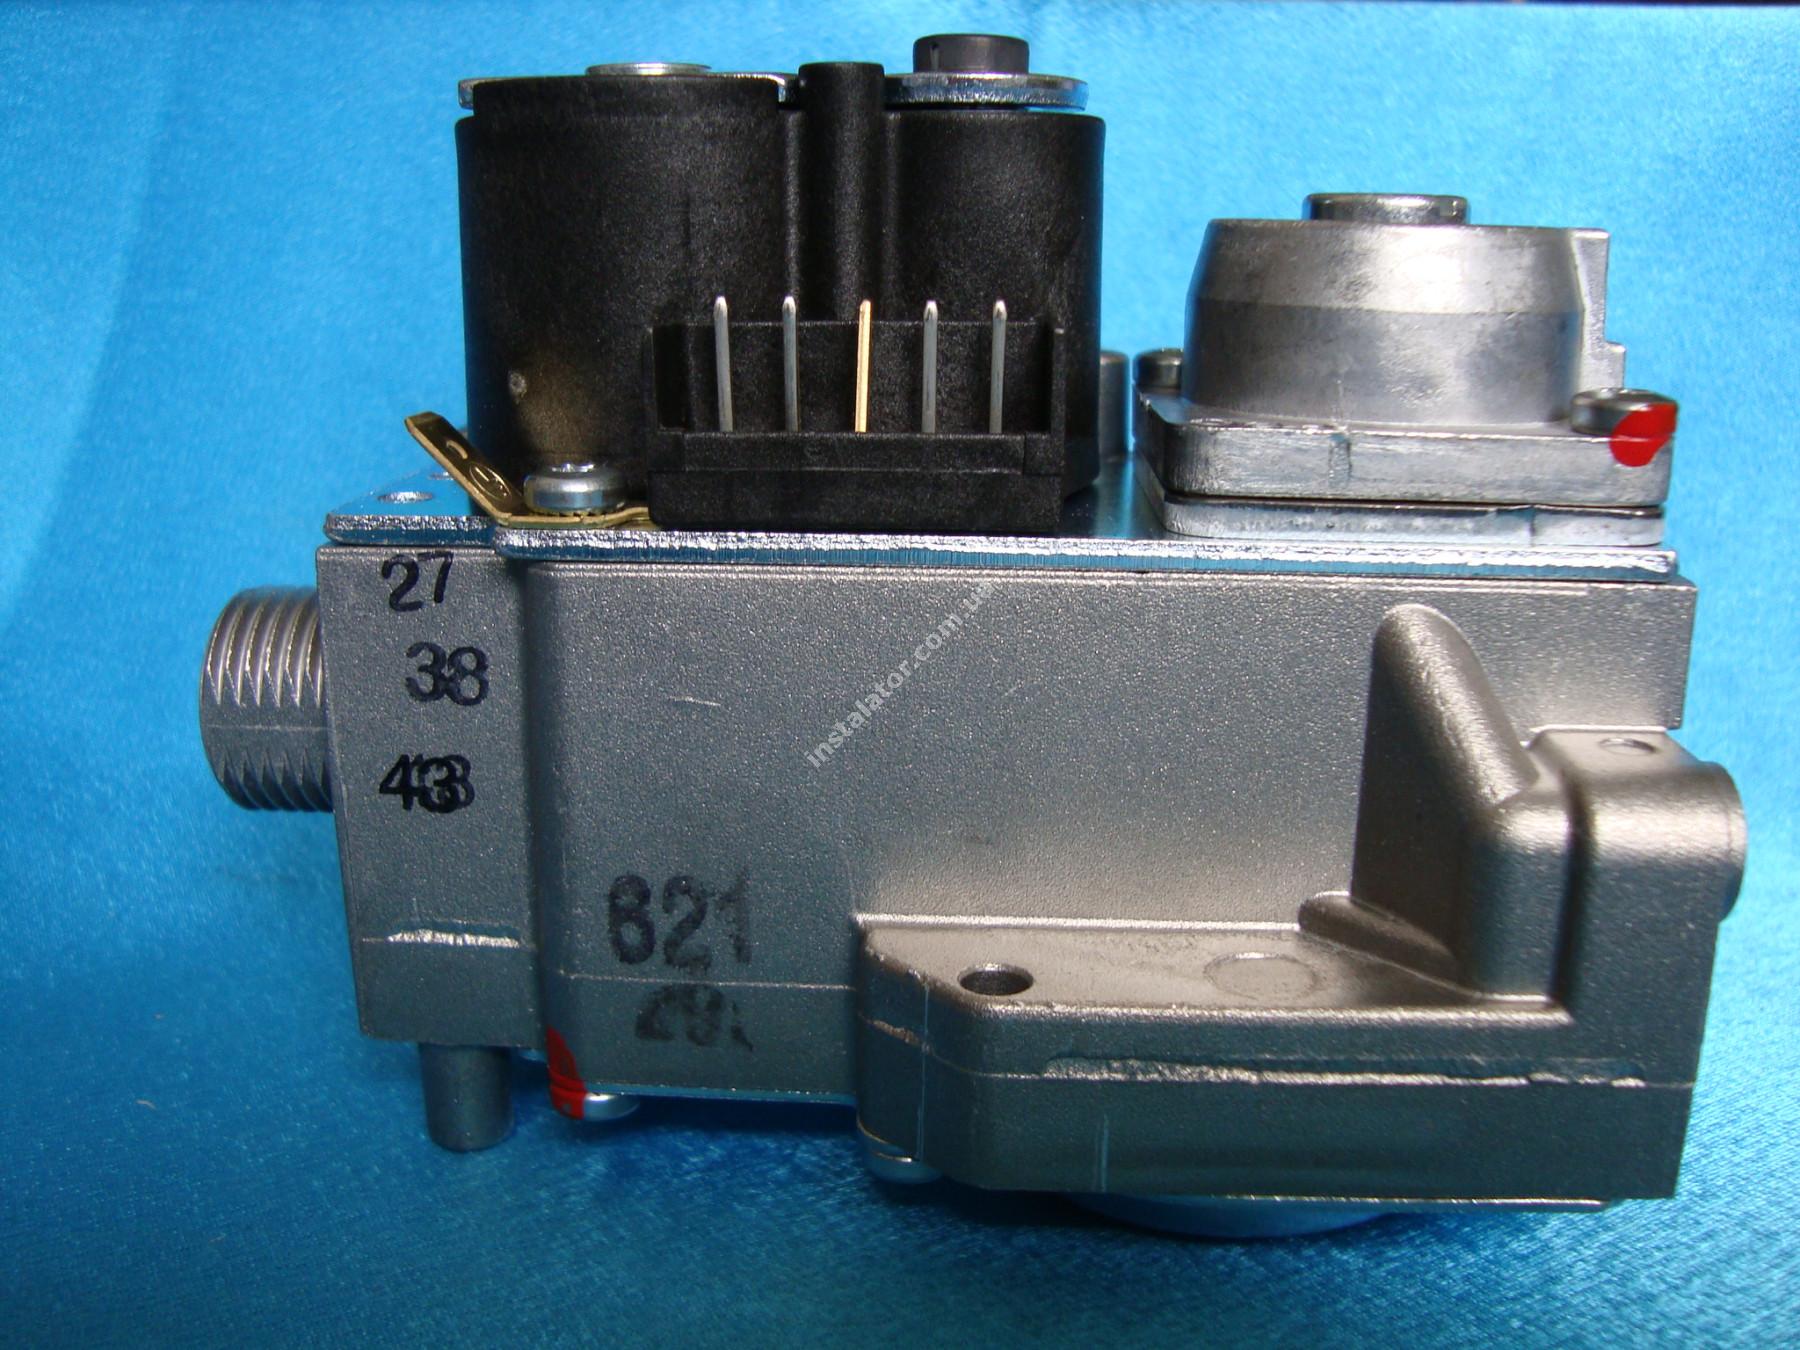 39804880 Газовий клапан FERROLI Domina, Domitop full-image-1